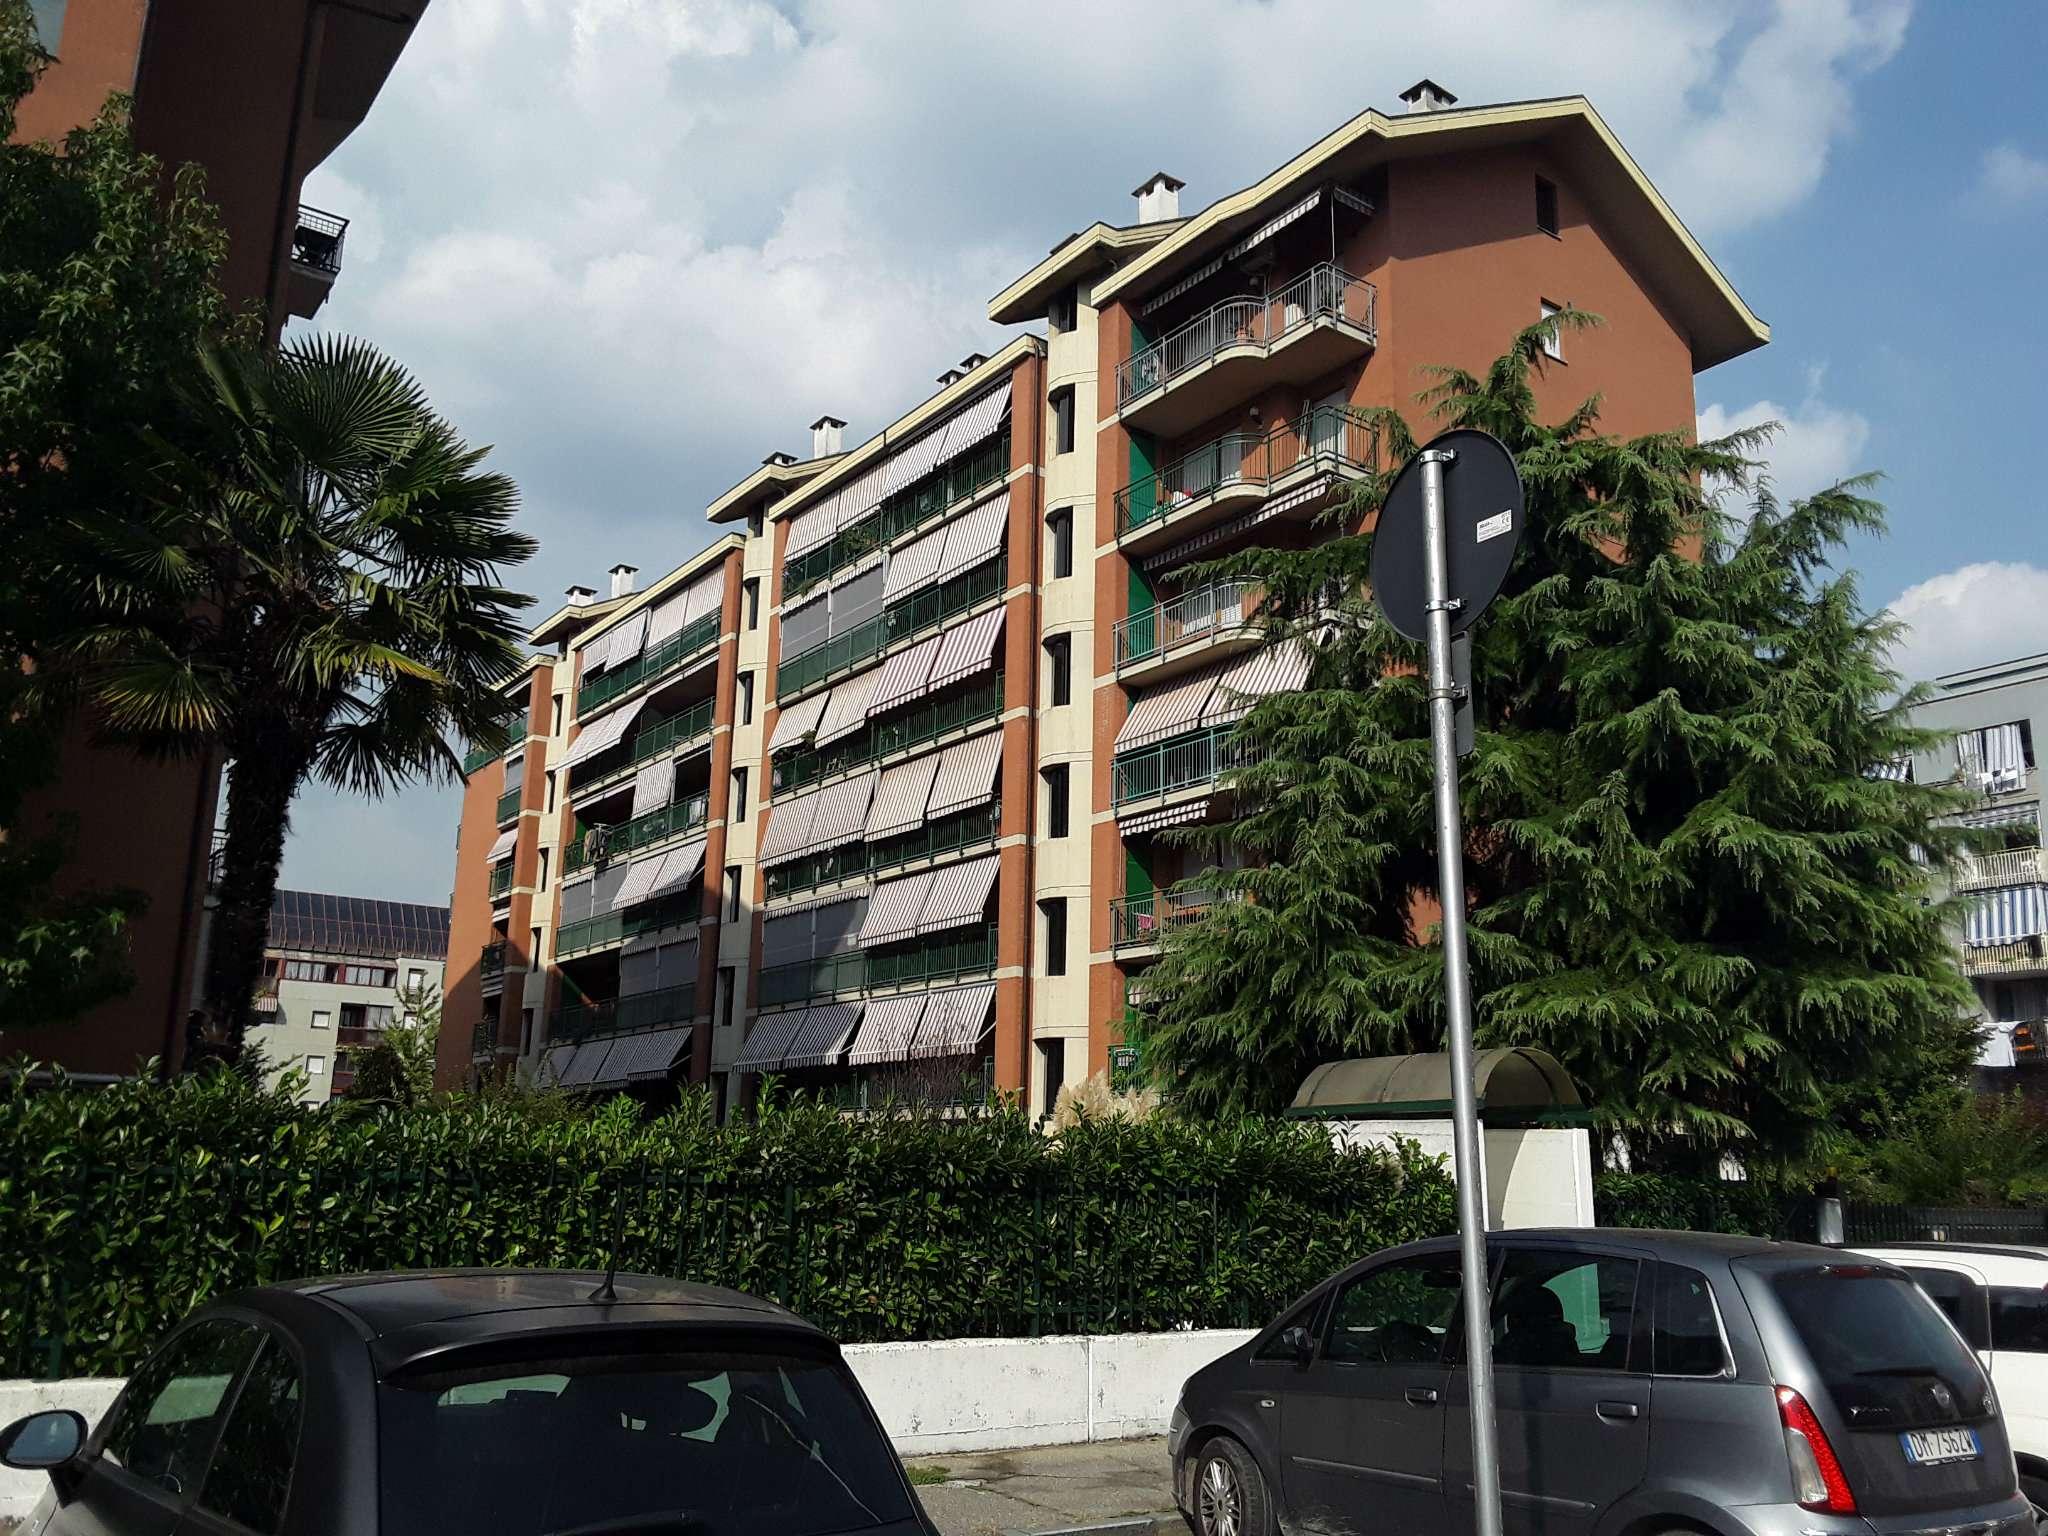 Foto 1 di Quadrilocale via riesi, frazione Pronda, Grugliasco